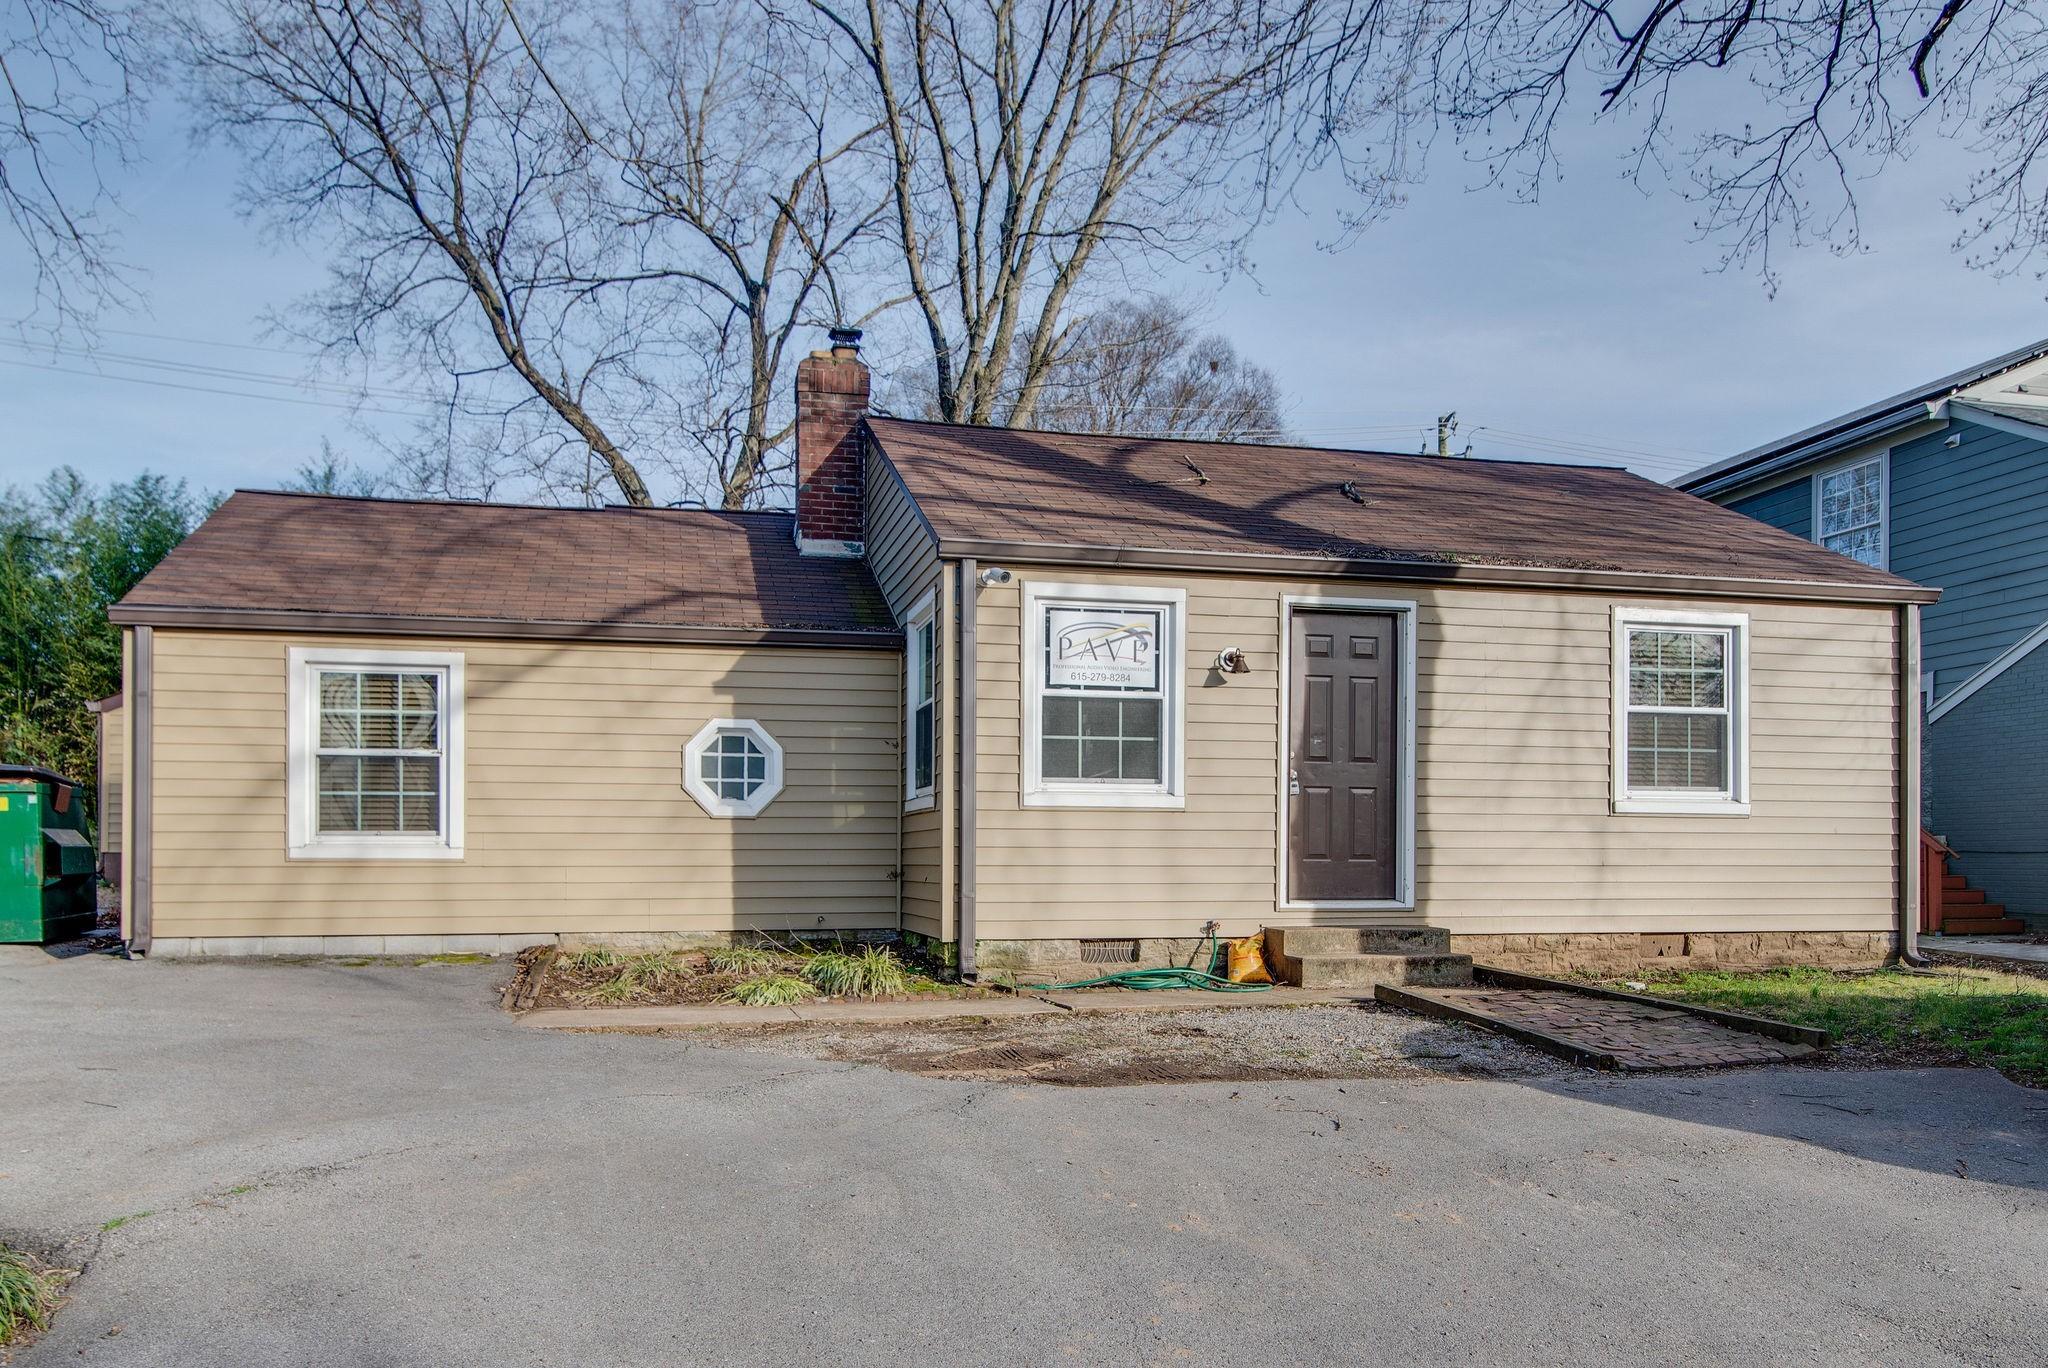 630 W Iris Dr Property Photo - Nashville, TN real estate listing